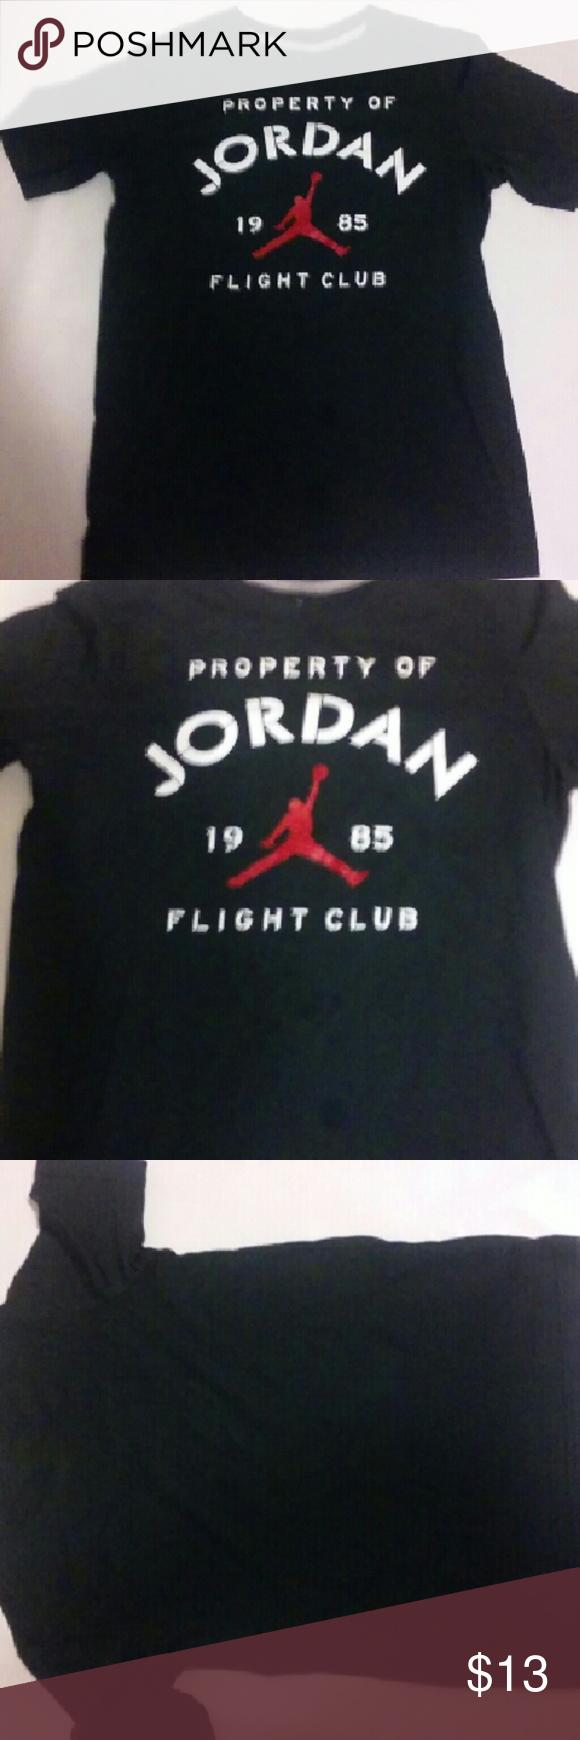 Boys Jordan tshirt black size large 12-13 years  Measurements Armpit to armpit 18in Length 24in Jordan Shirts & Tops Tees - Short Sleeve